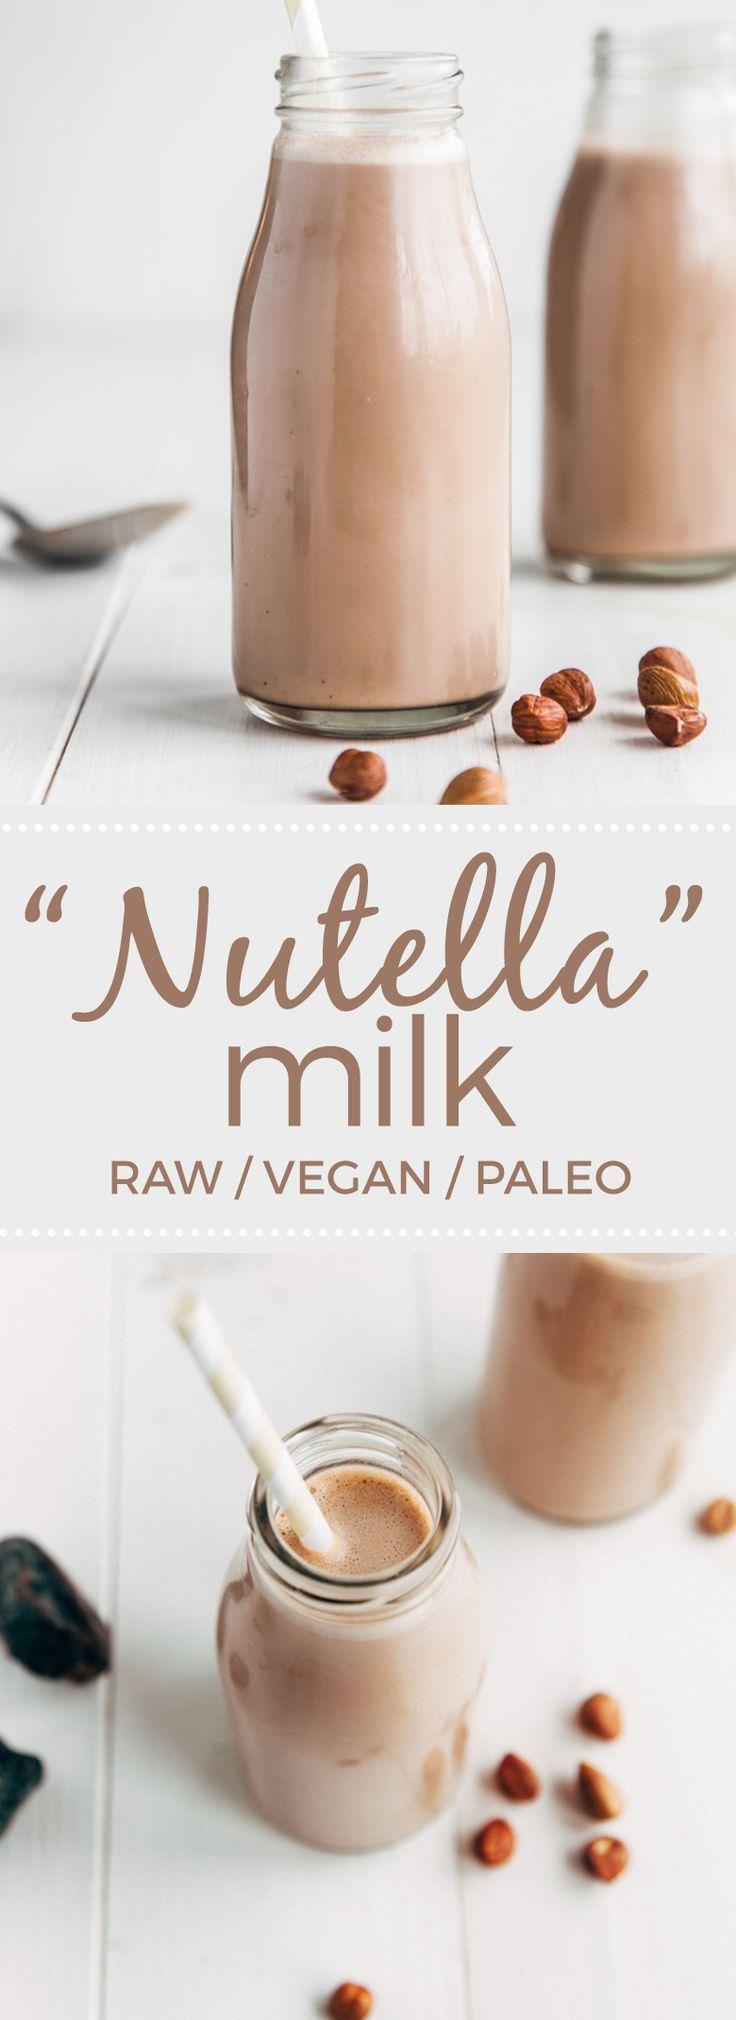 Raw Paleo Vegan Chocolate Hazelnut Milk #DateSweetened  | healthy recipe ideas @xhealthyrecipex |